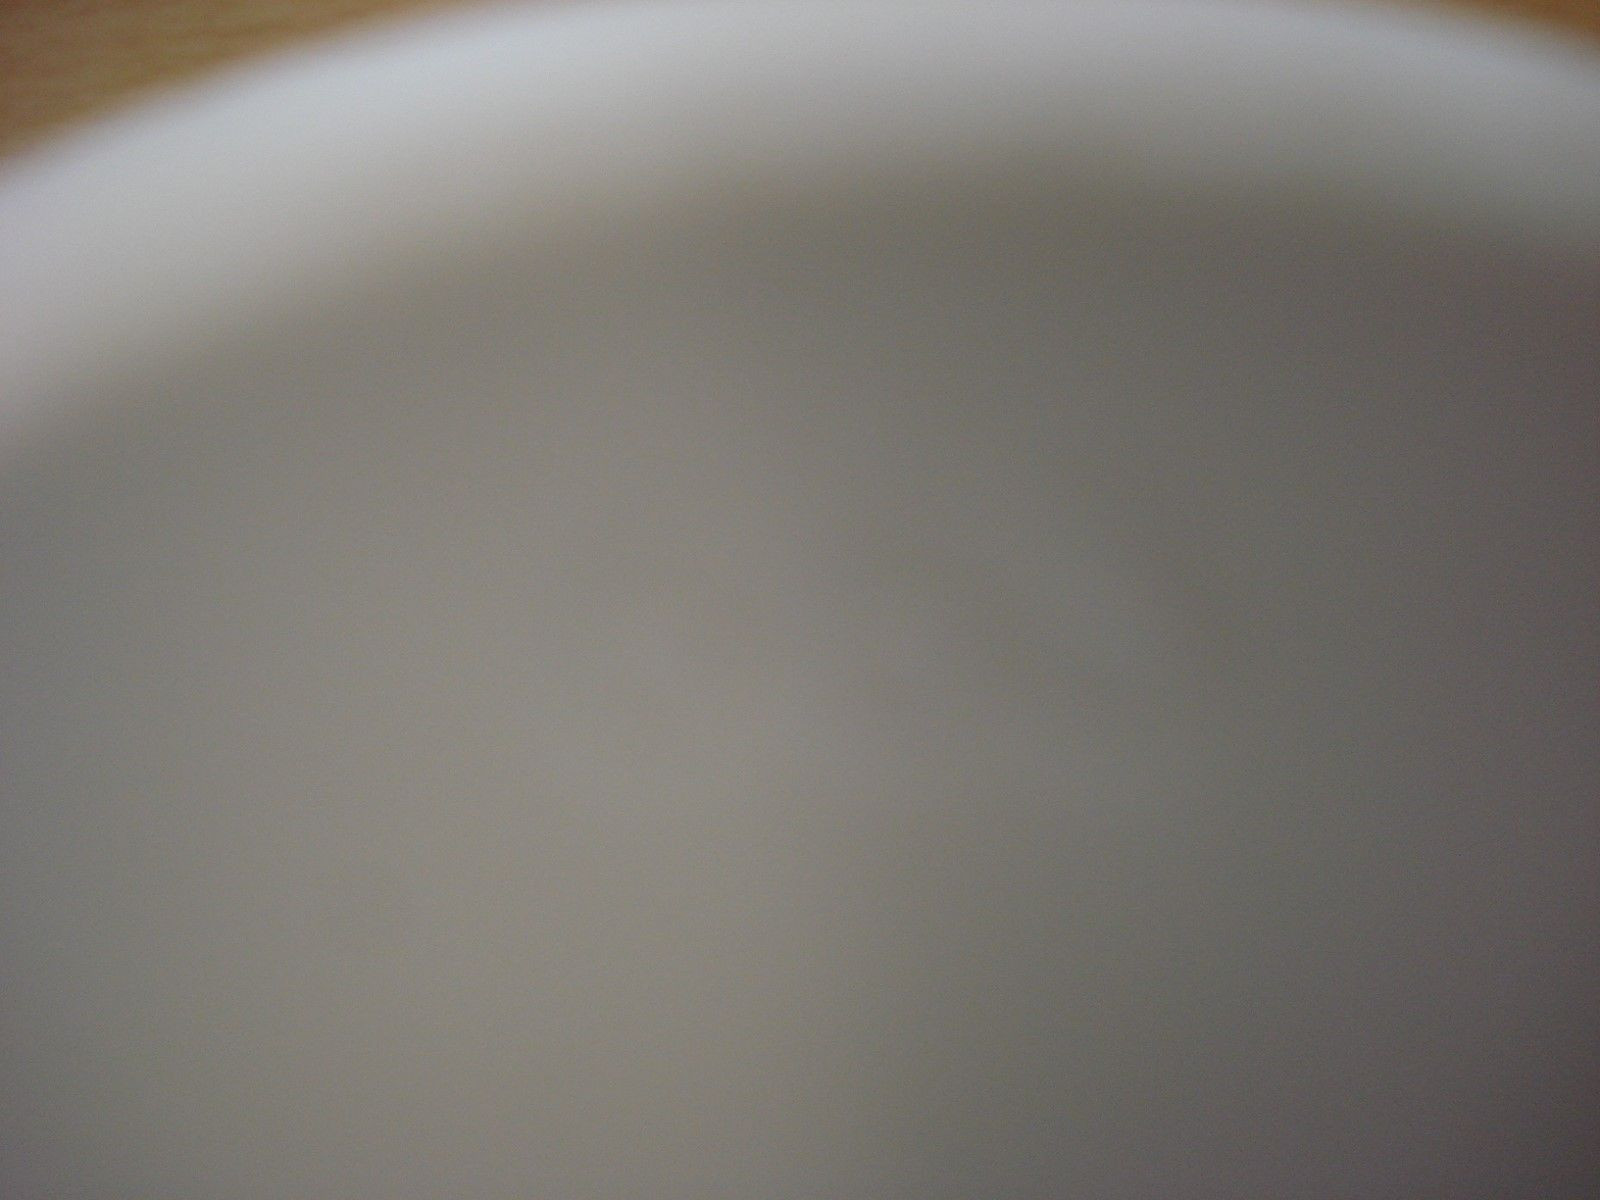 ak kaiser porcelain vase of kaiser germany white bisque vase signed m frey a15 00 picclick uk intended for 6 of 8 kaiser germany white bisque vase signed m frey 7 of 8 kaiser germany white bisque vase